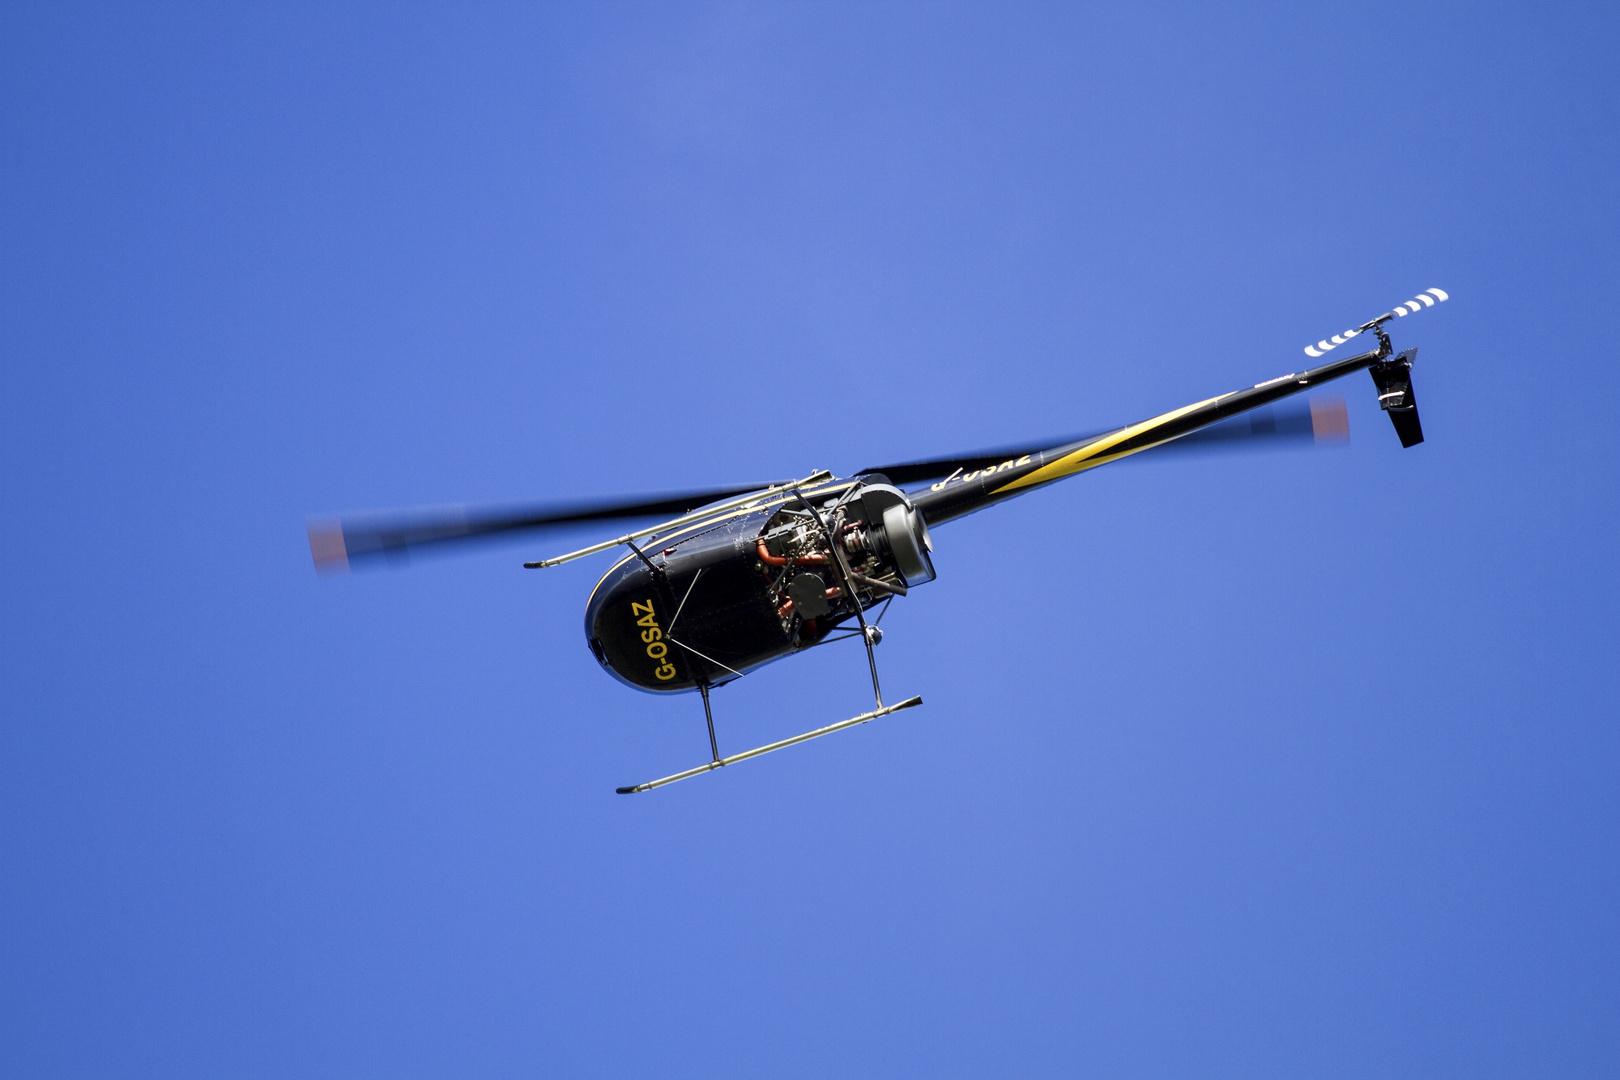 G-OSAZ Robinson R22 Beta Helicopter